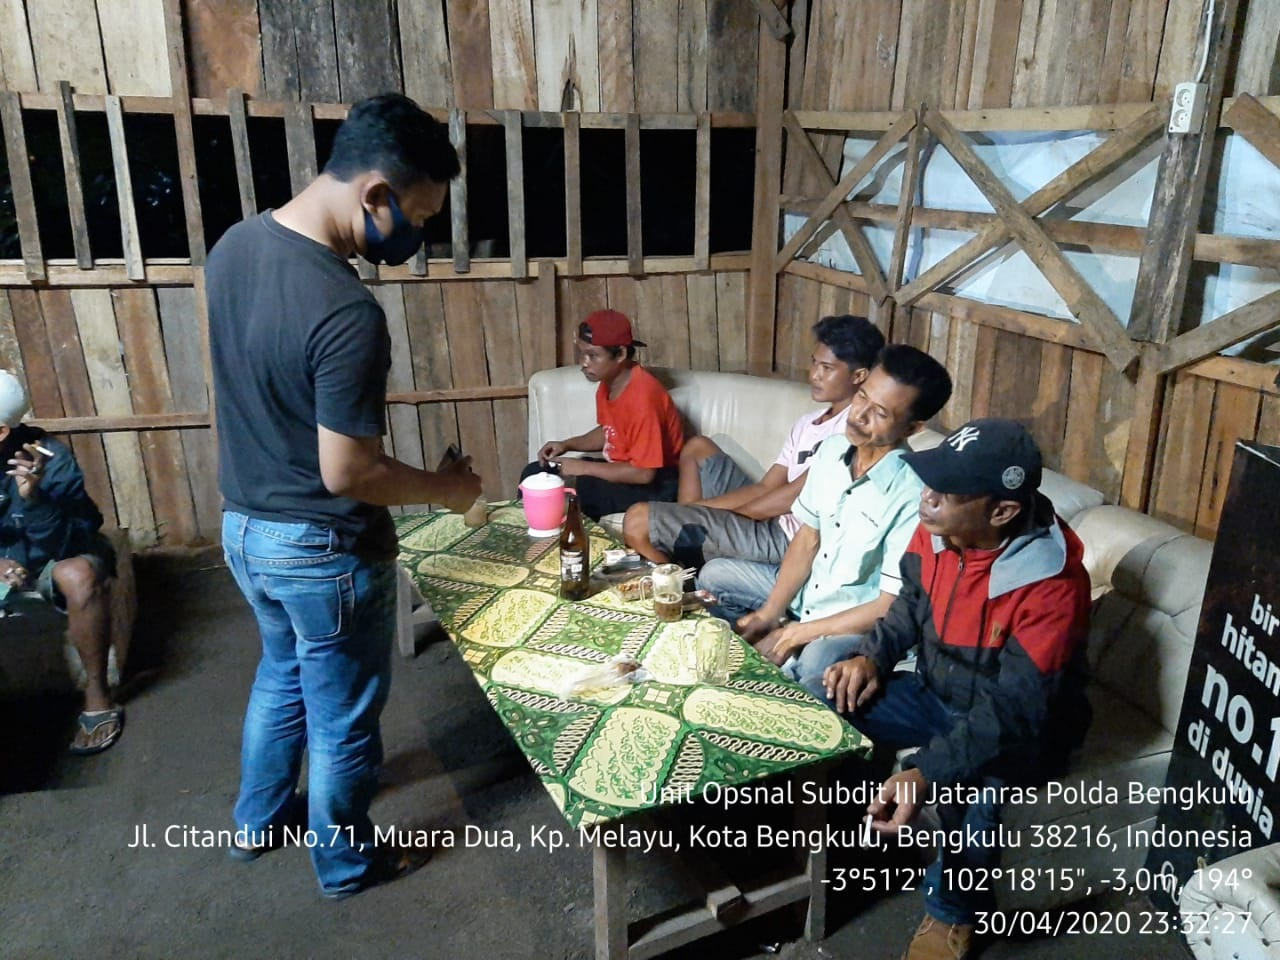 Ops Pekat Nala, Polisi Sita 50 Liter Tuak